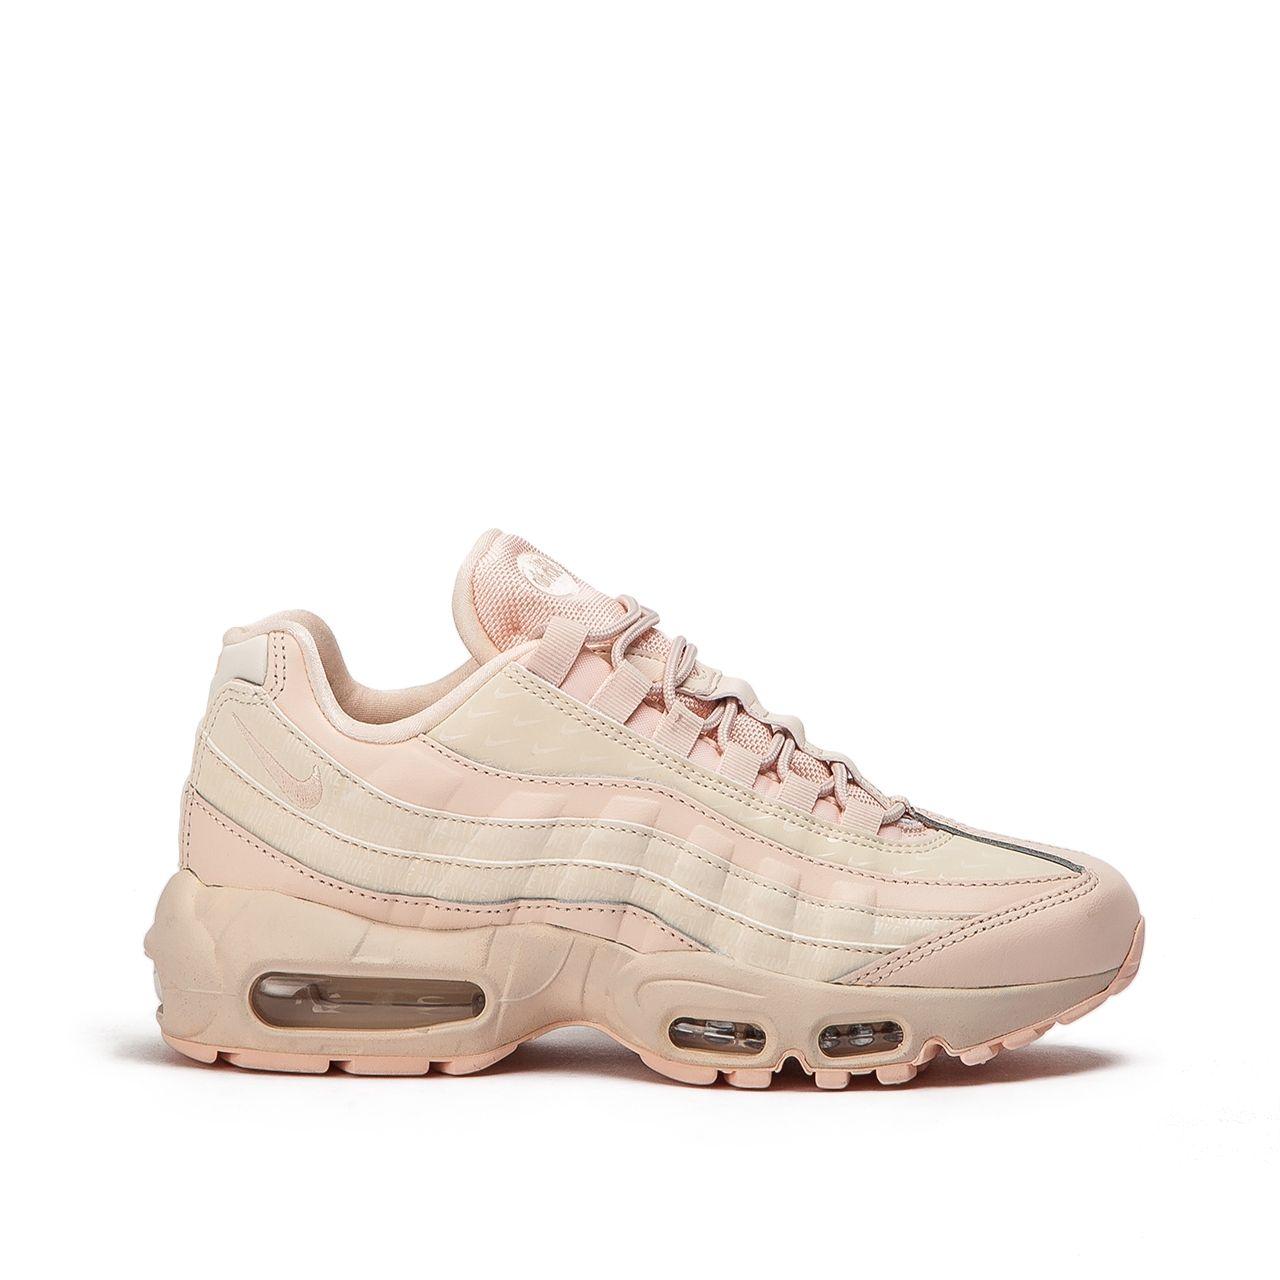 Nike WMNS Air Max 95 LX (Beige) #sneaker #lpu | Sneaker